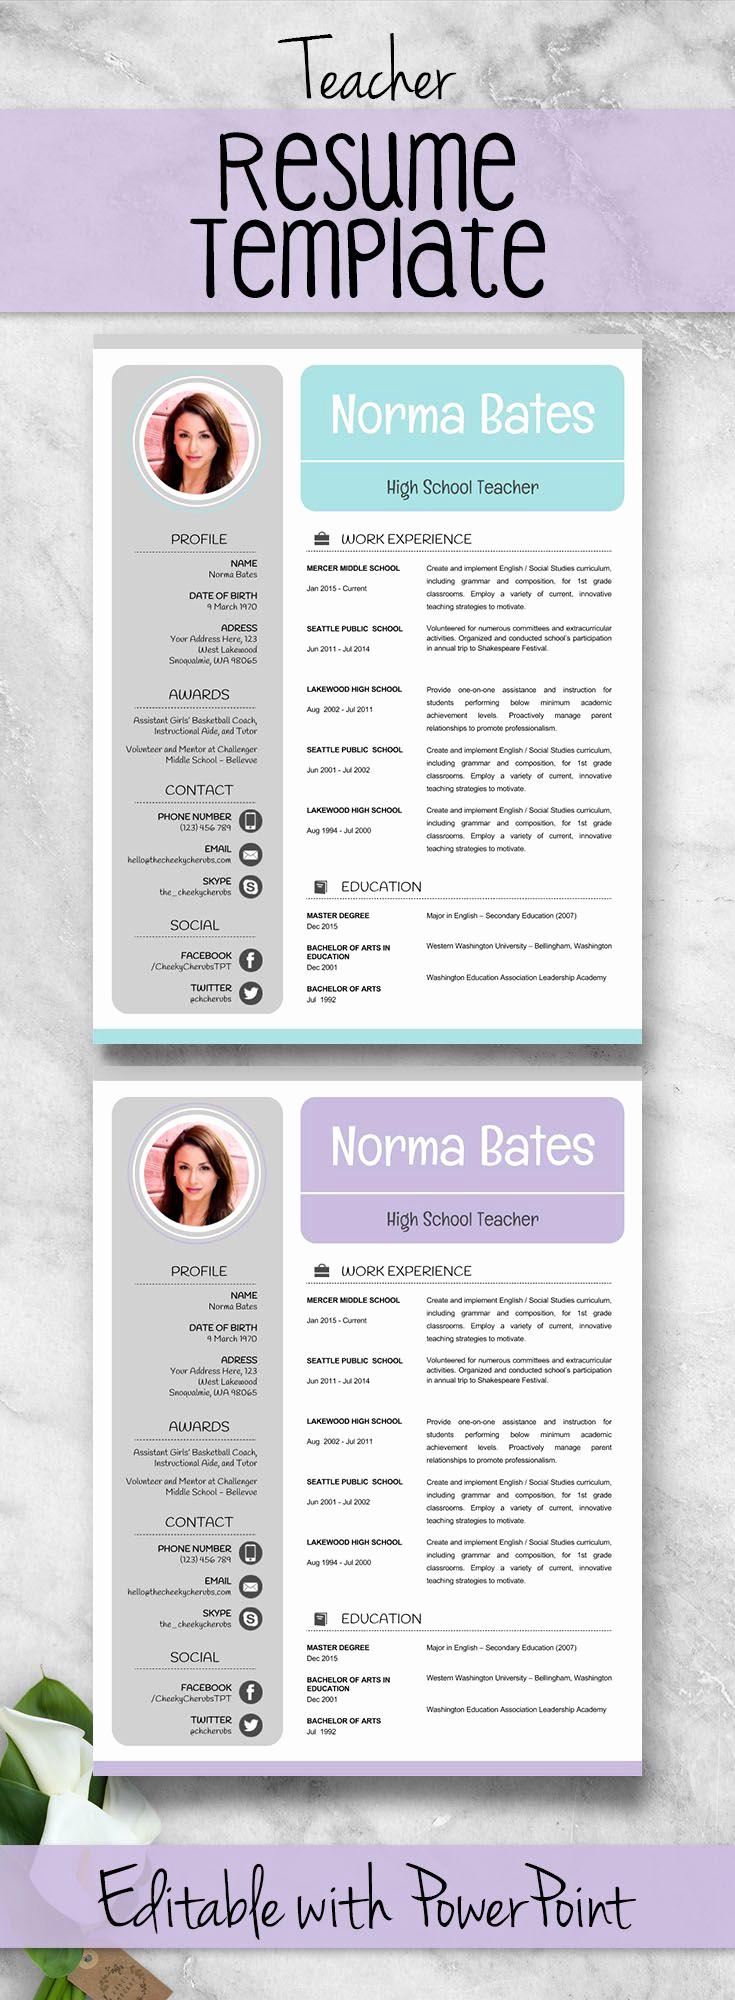 Resume Templates for Teachers Beautiful Best 25 Teacher Resume Template Ideas On Pinterest